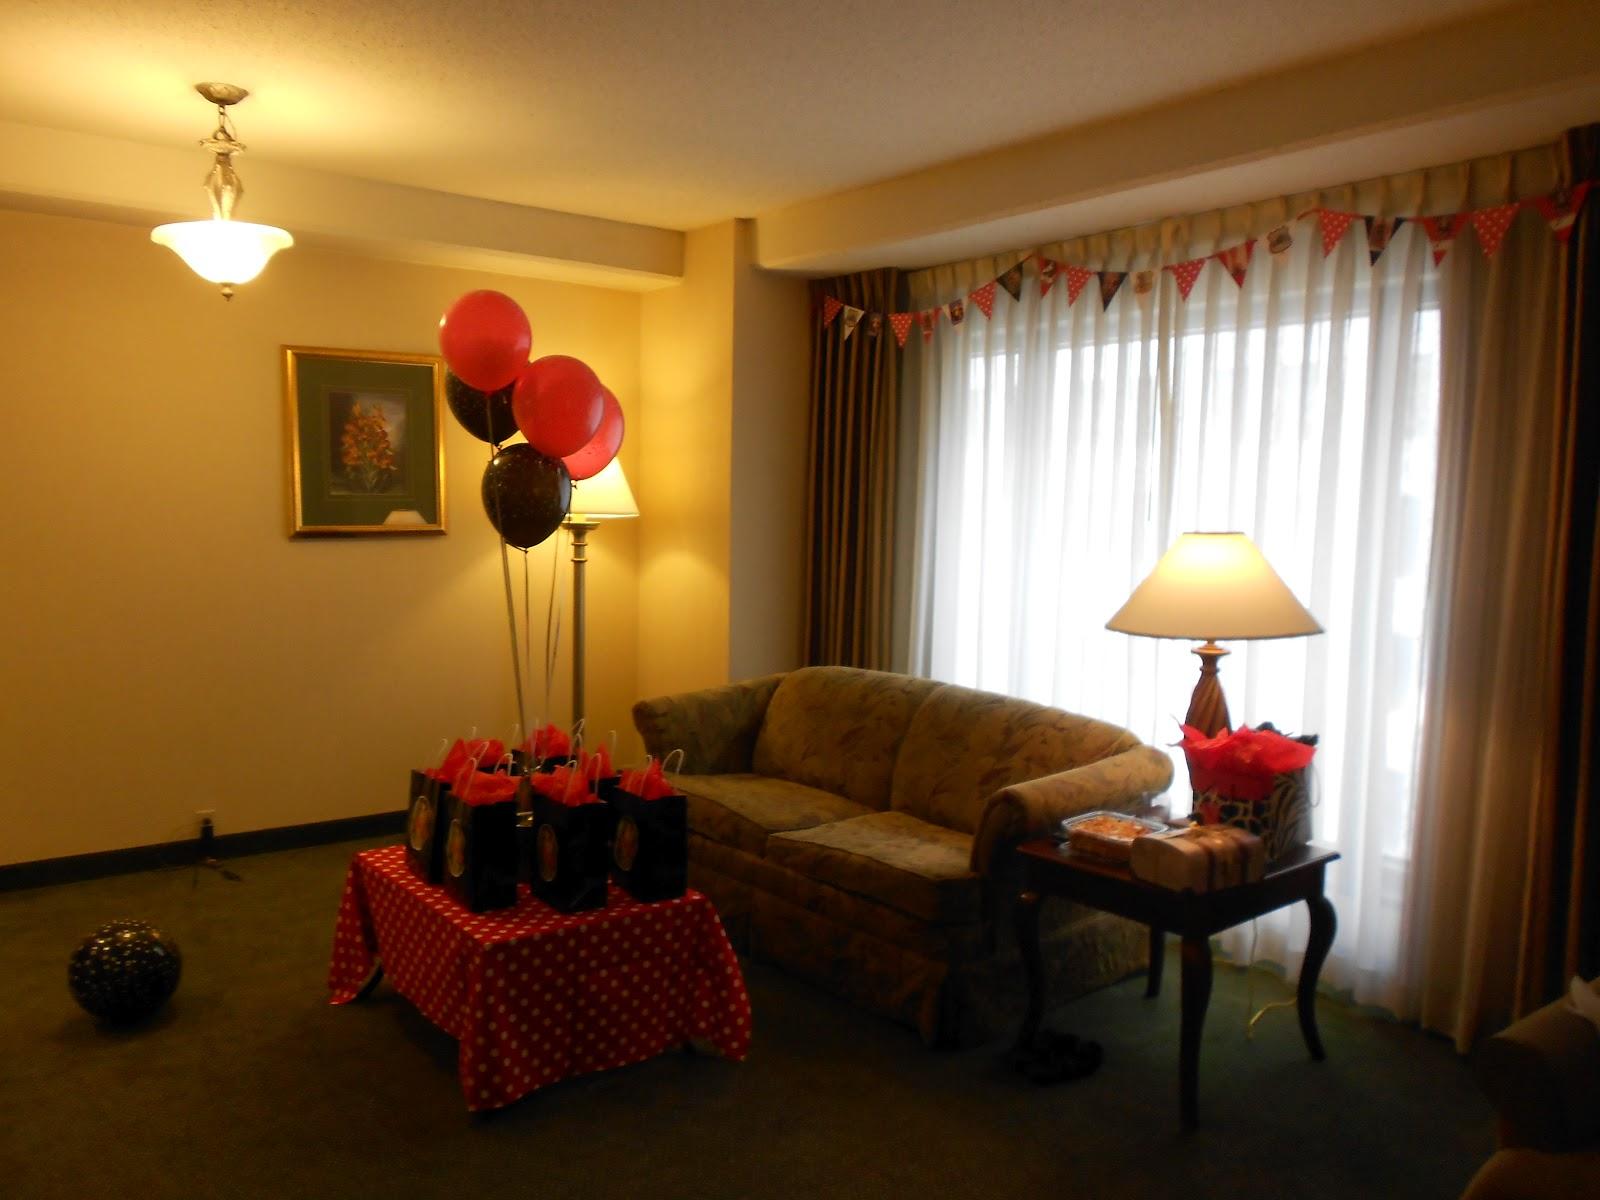 Wedding Night Hotel Room Decorations - Home Decorating Ideas